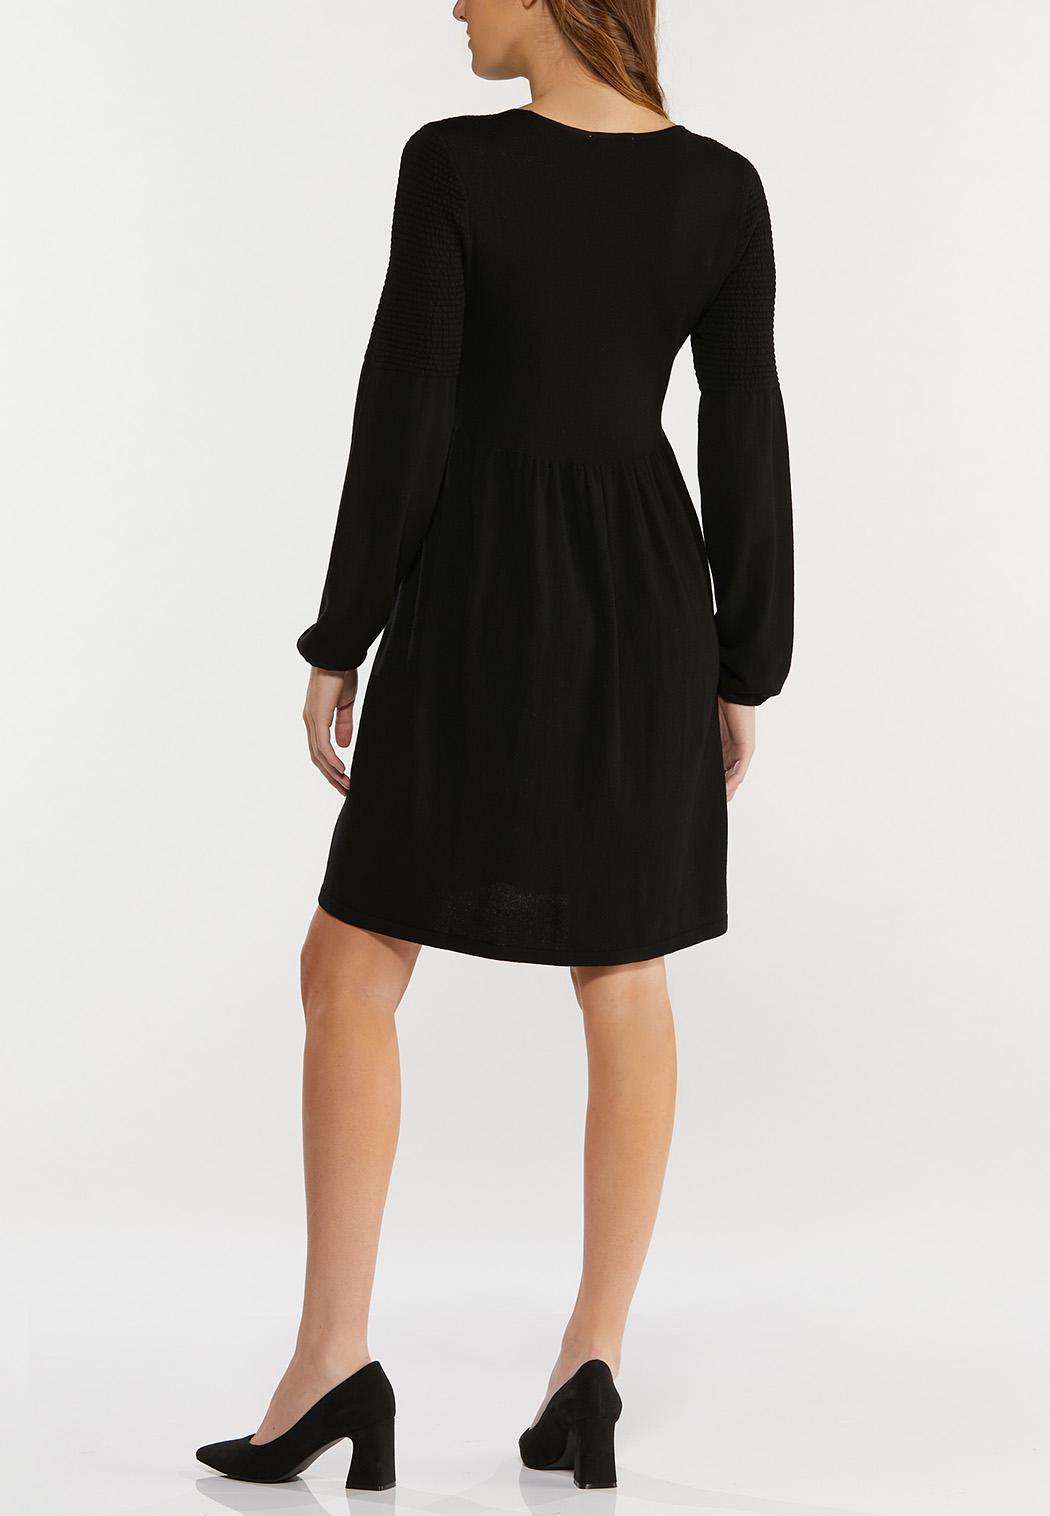 Plus Size Textured Black Babydoll Dress (Item #44465980)